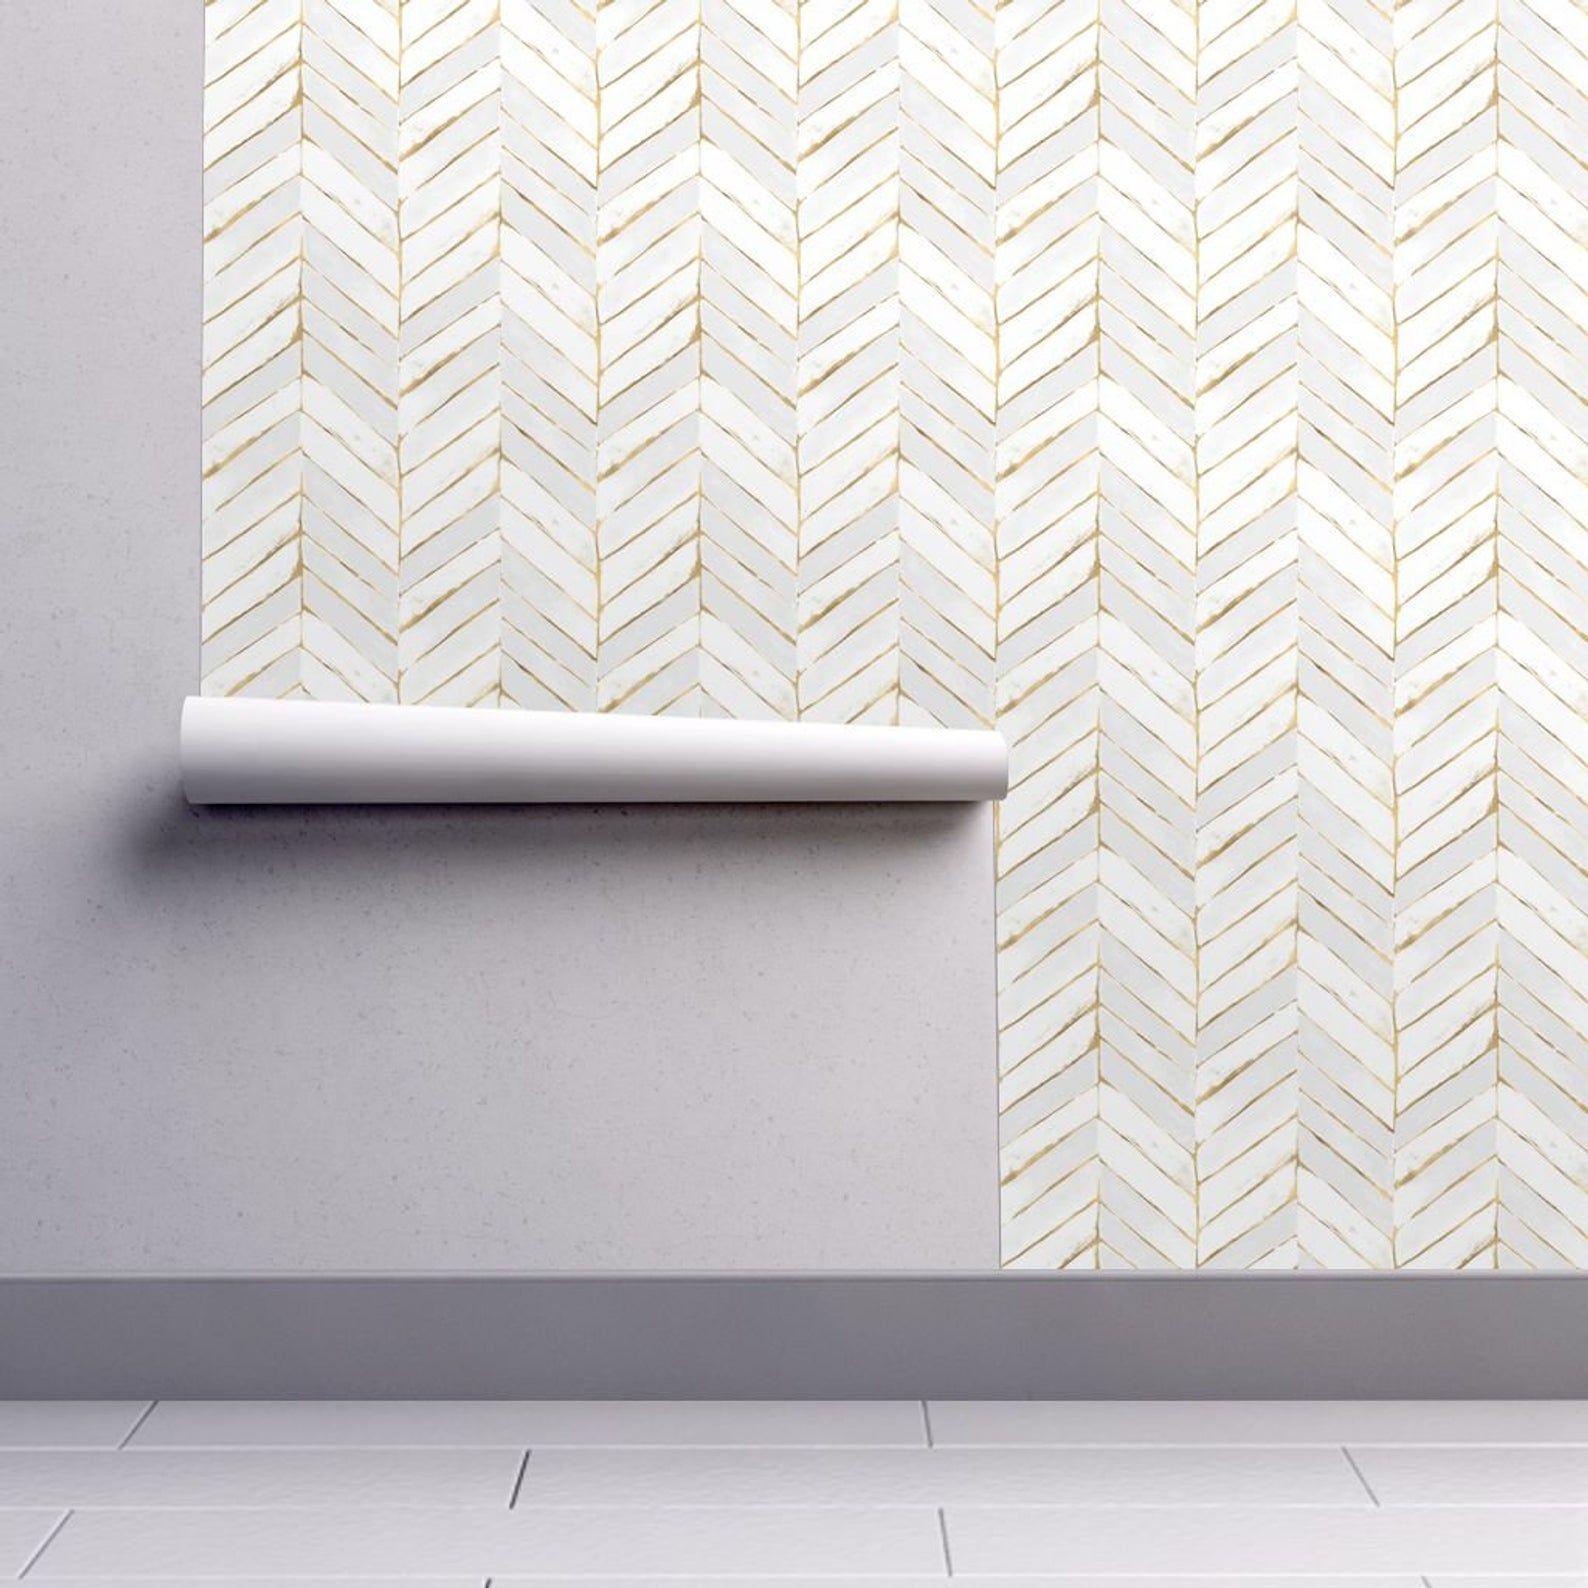 Peel-and-Stick Removable Wallpaper Chevron White Gold Herringbone